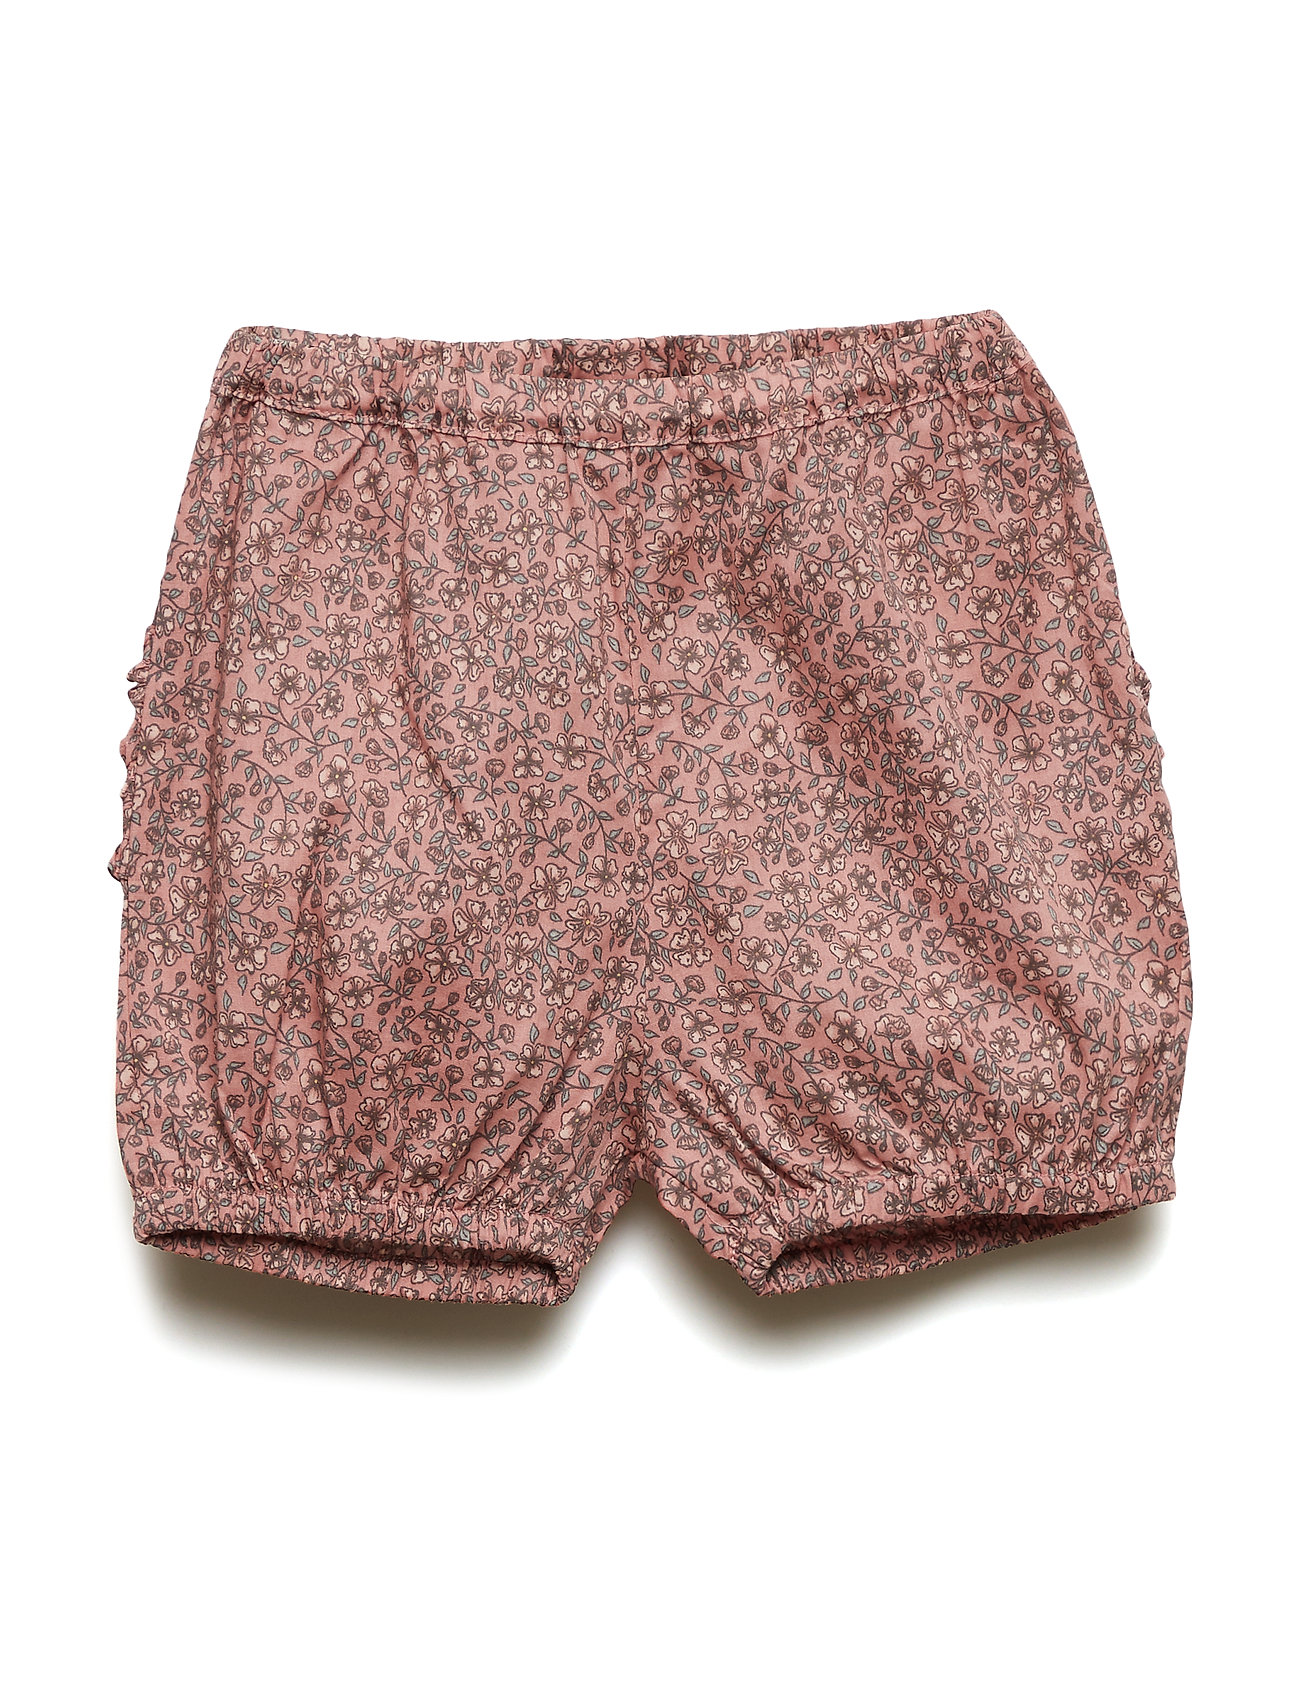 Wheat Nappy Pants Ruffles - SOFT ROUGE